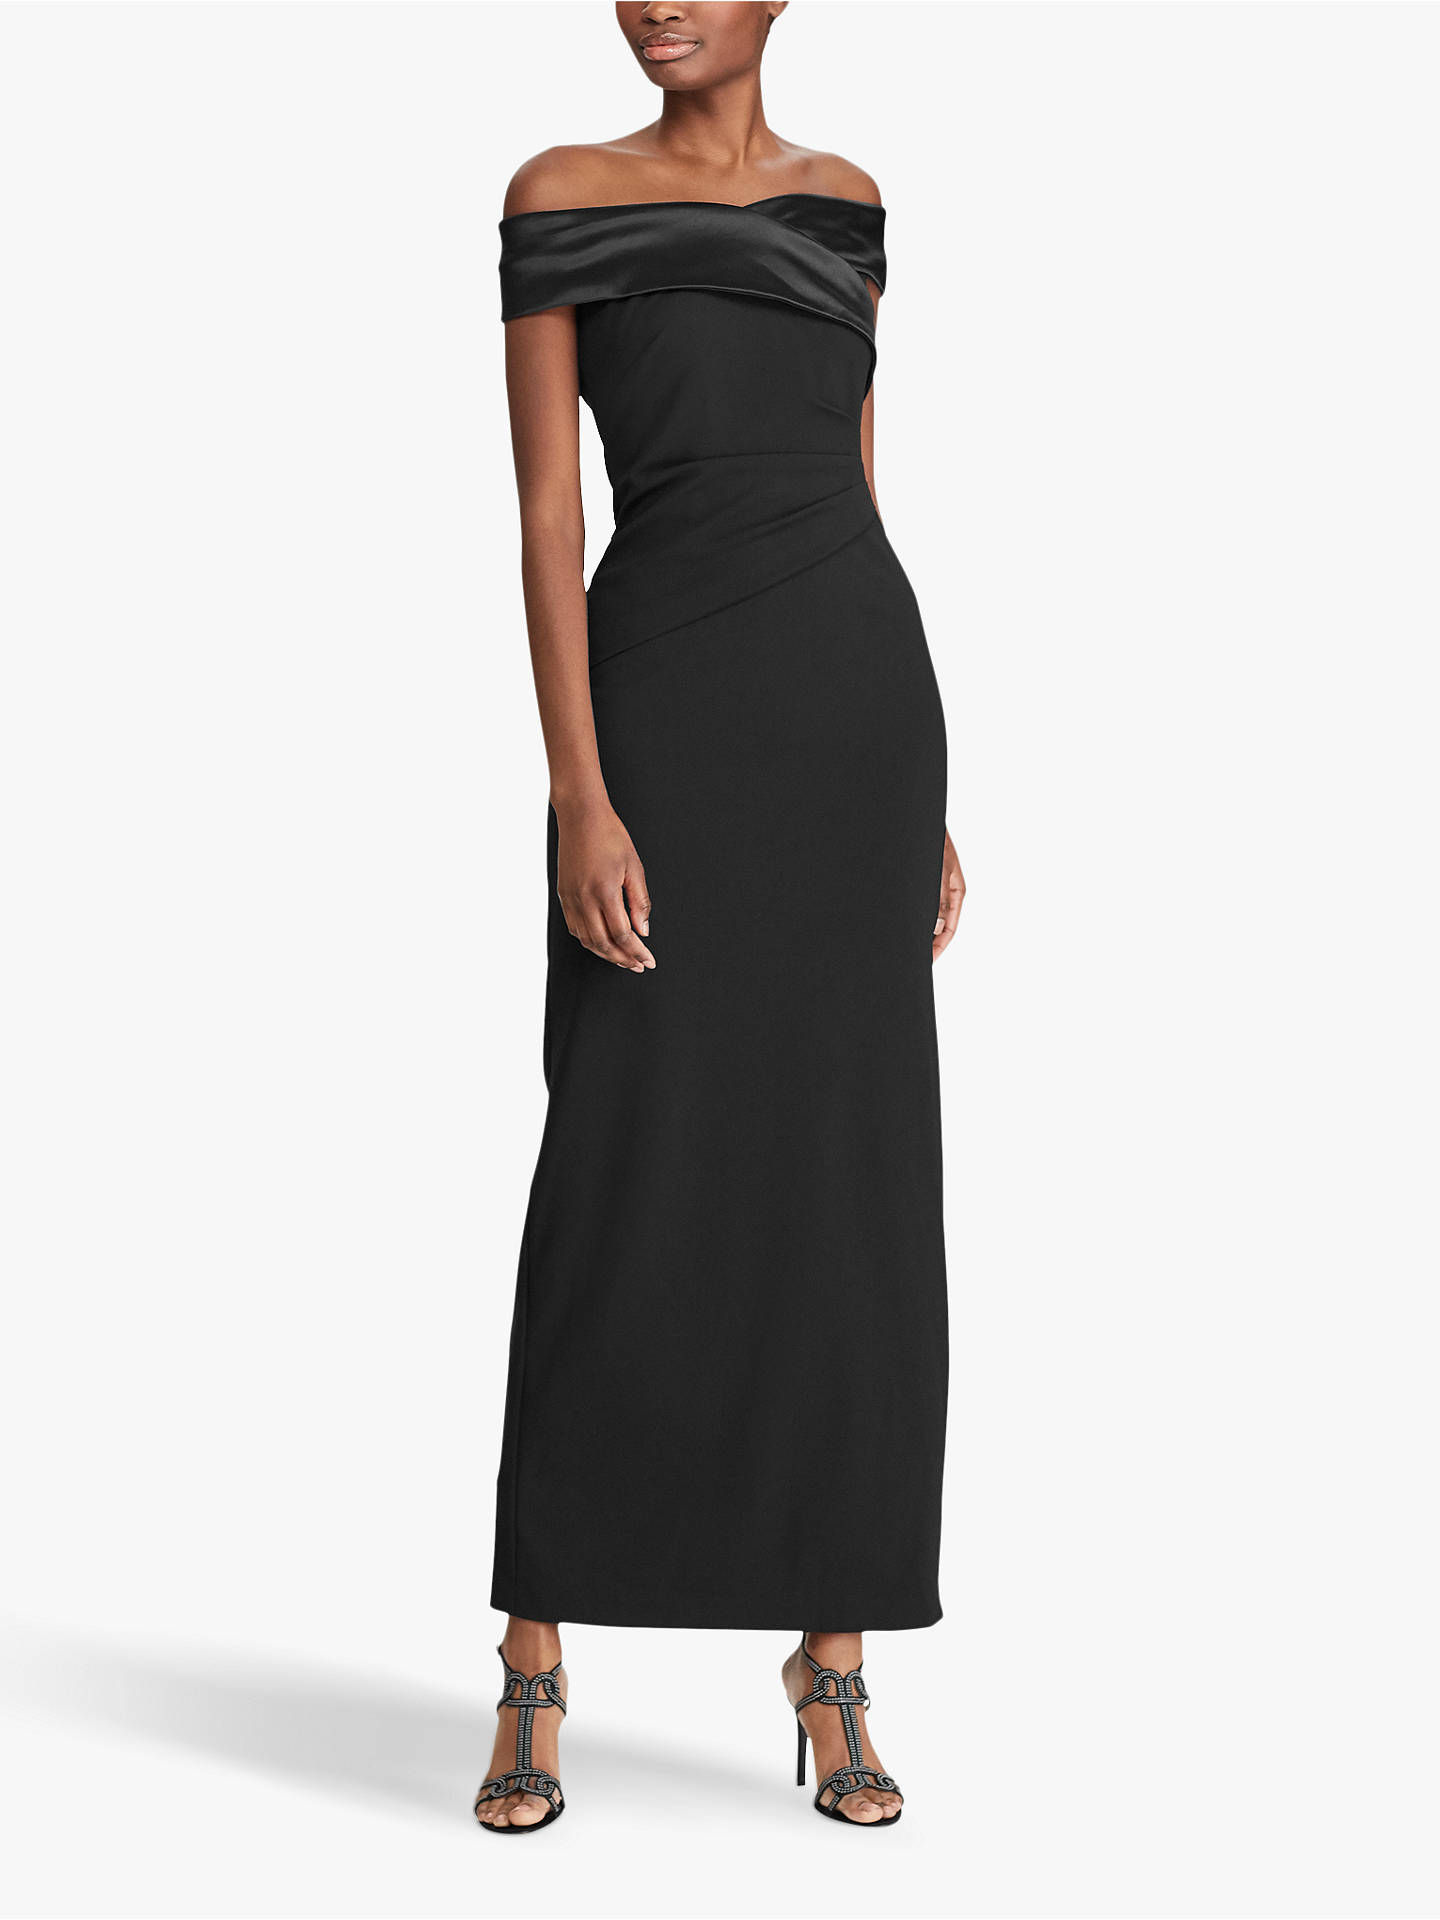 b837f2fcf3d8 Buy Lauren Ralph Lauren Crepe Off Shoulder Maxi Dress